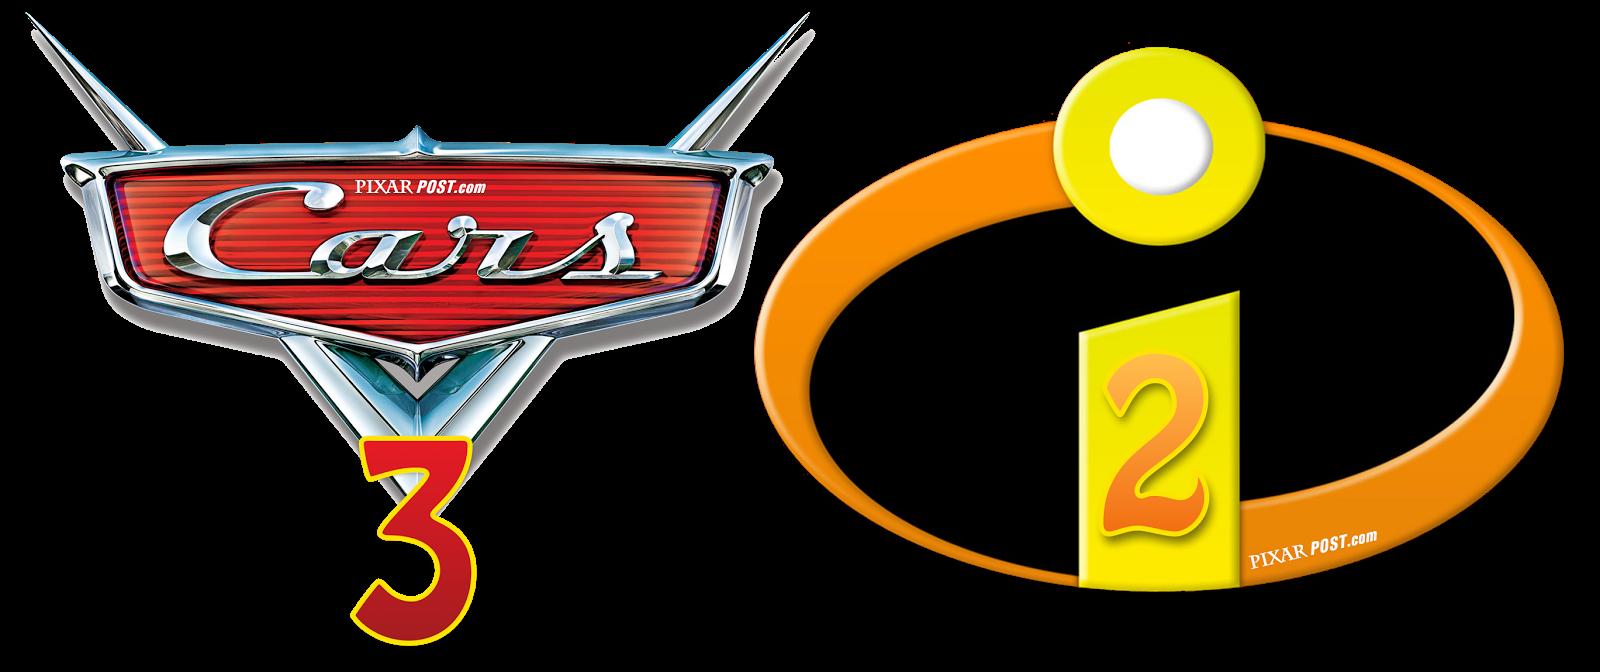 Disney Cars 2 Logo Gallery